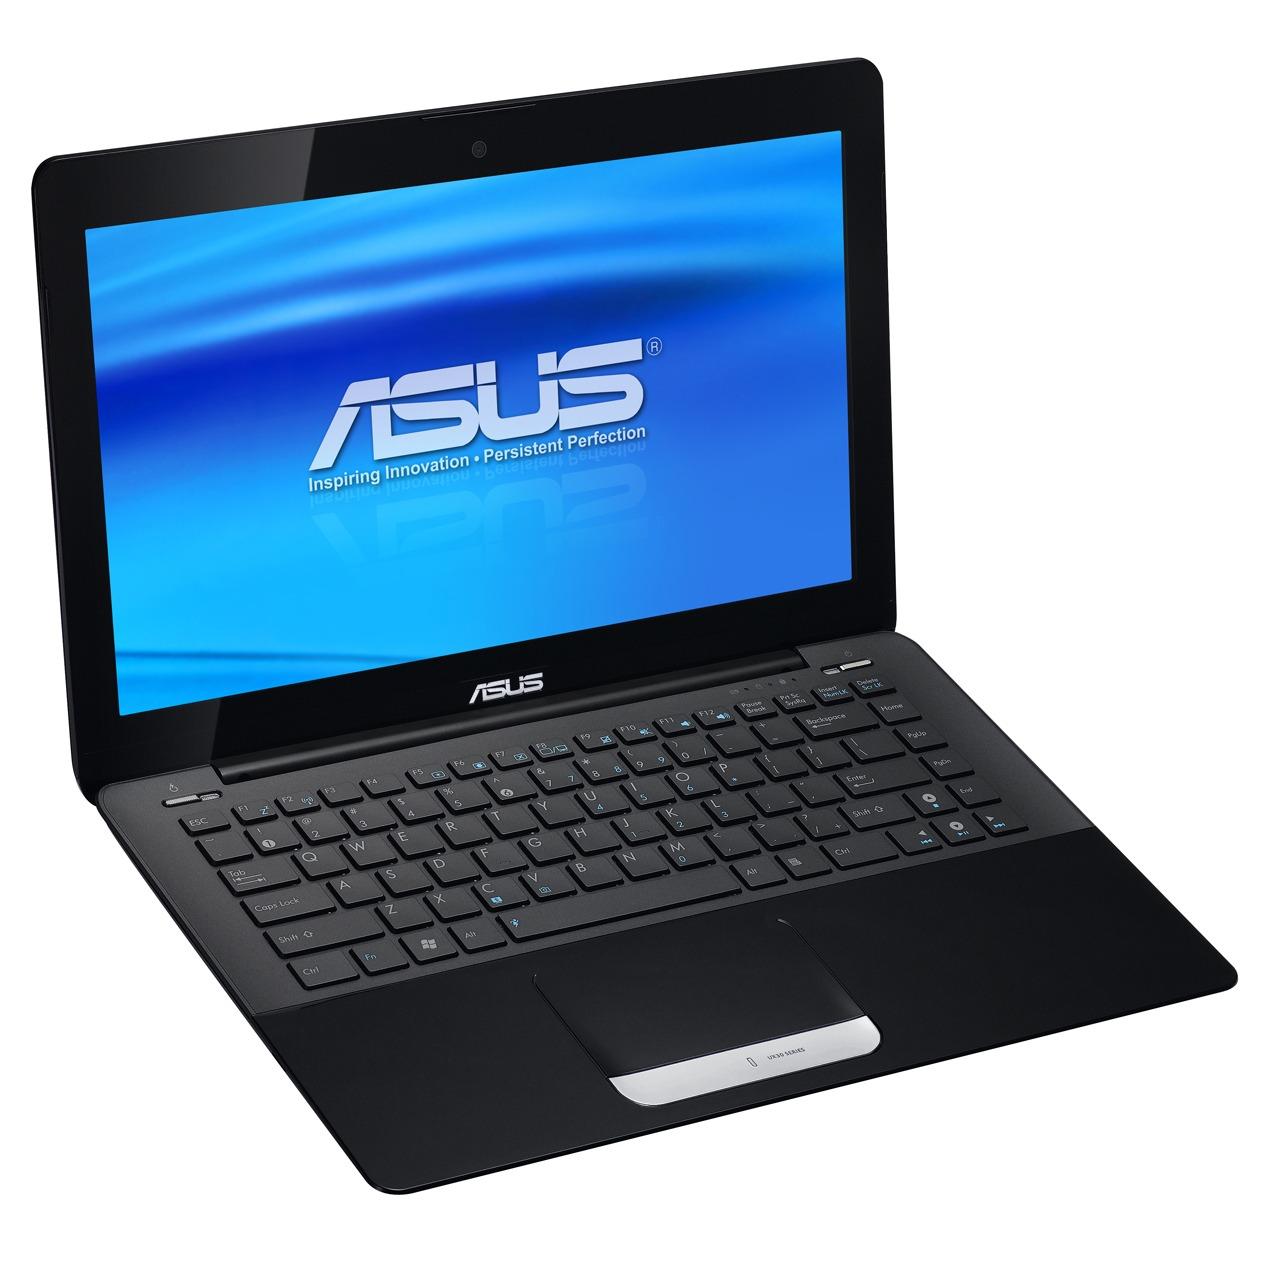 "PC portable ASUS UX30-QX078X ASUS UX30-QX078X - Intel Core 2 Duo SU7300 4 Go 500 Go 13.3"" LCD Wi-Fi N/Bluetooth Webcam Windows 7 Professionnel (garantie constructeur 2 ans)"